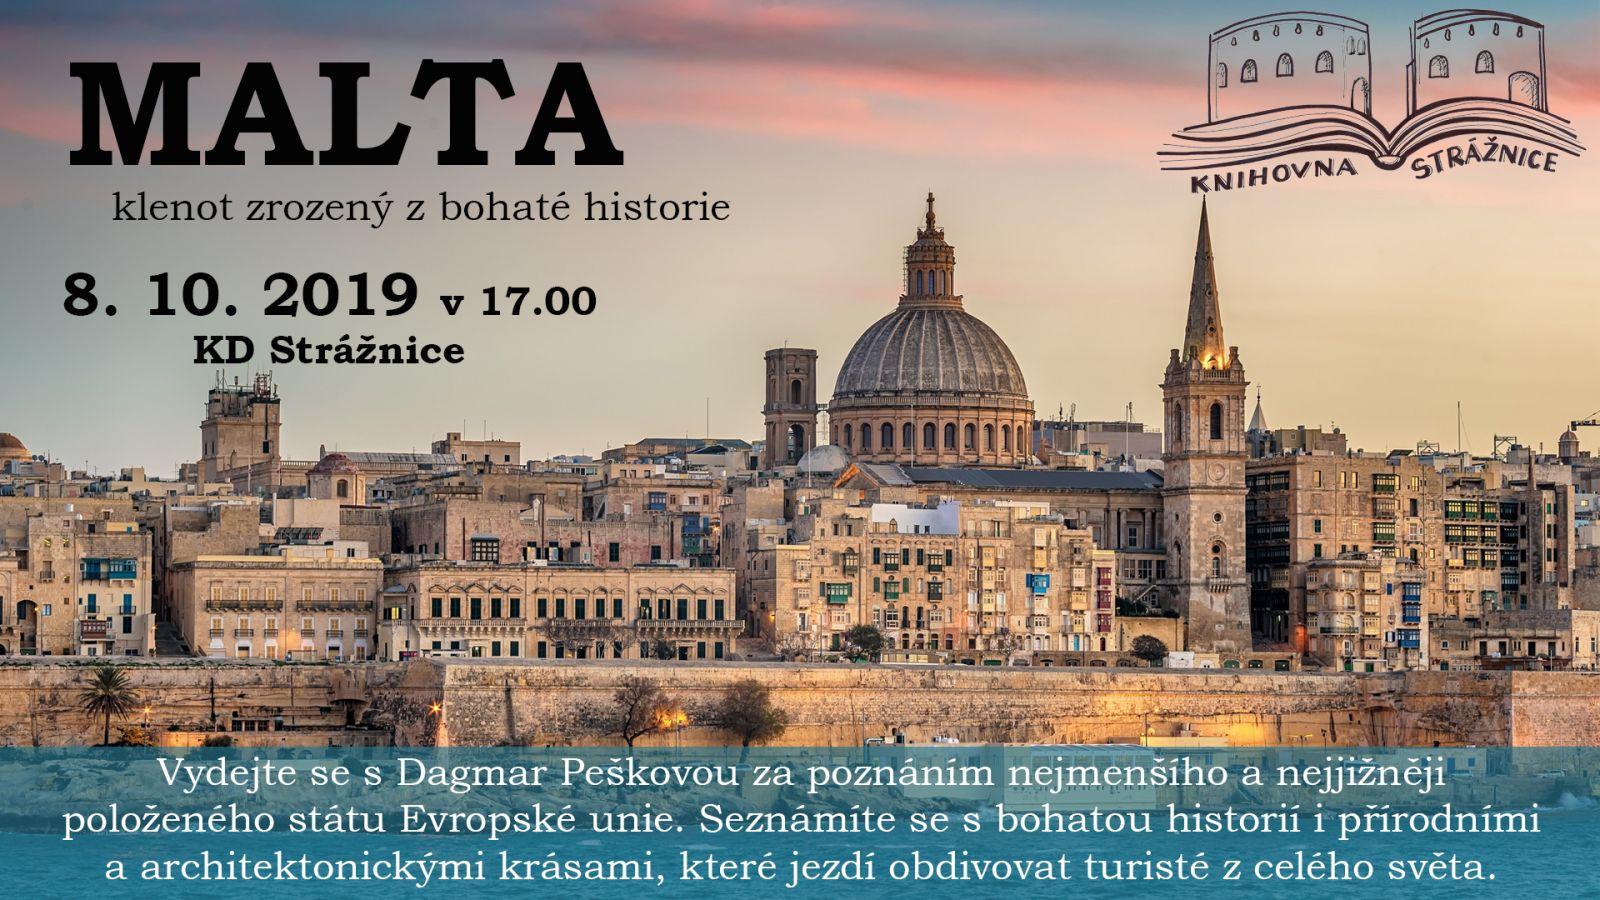 Malta, 8. 10. 2019 v 17.00